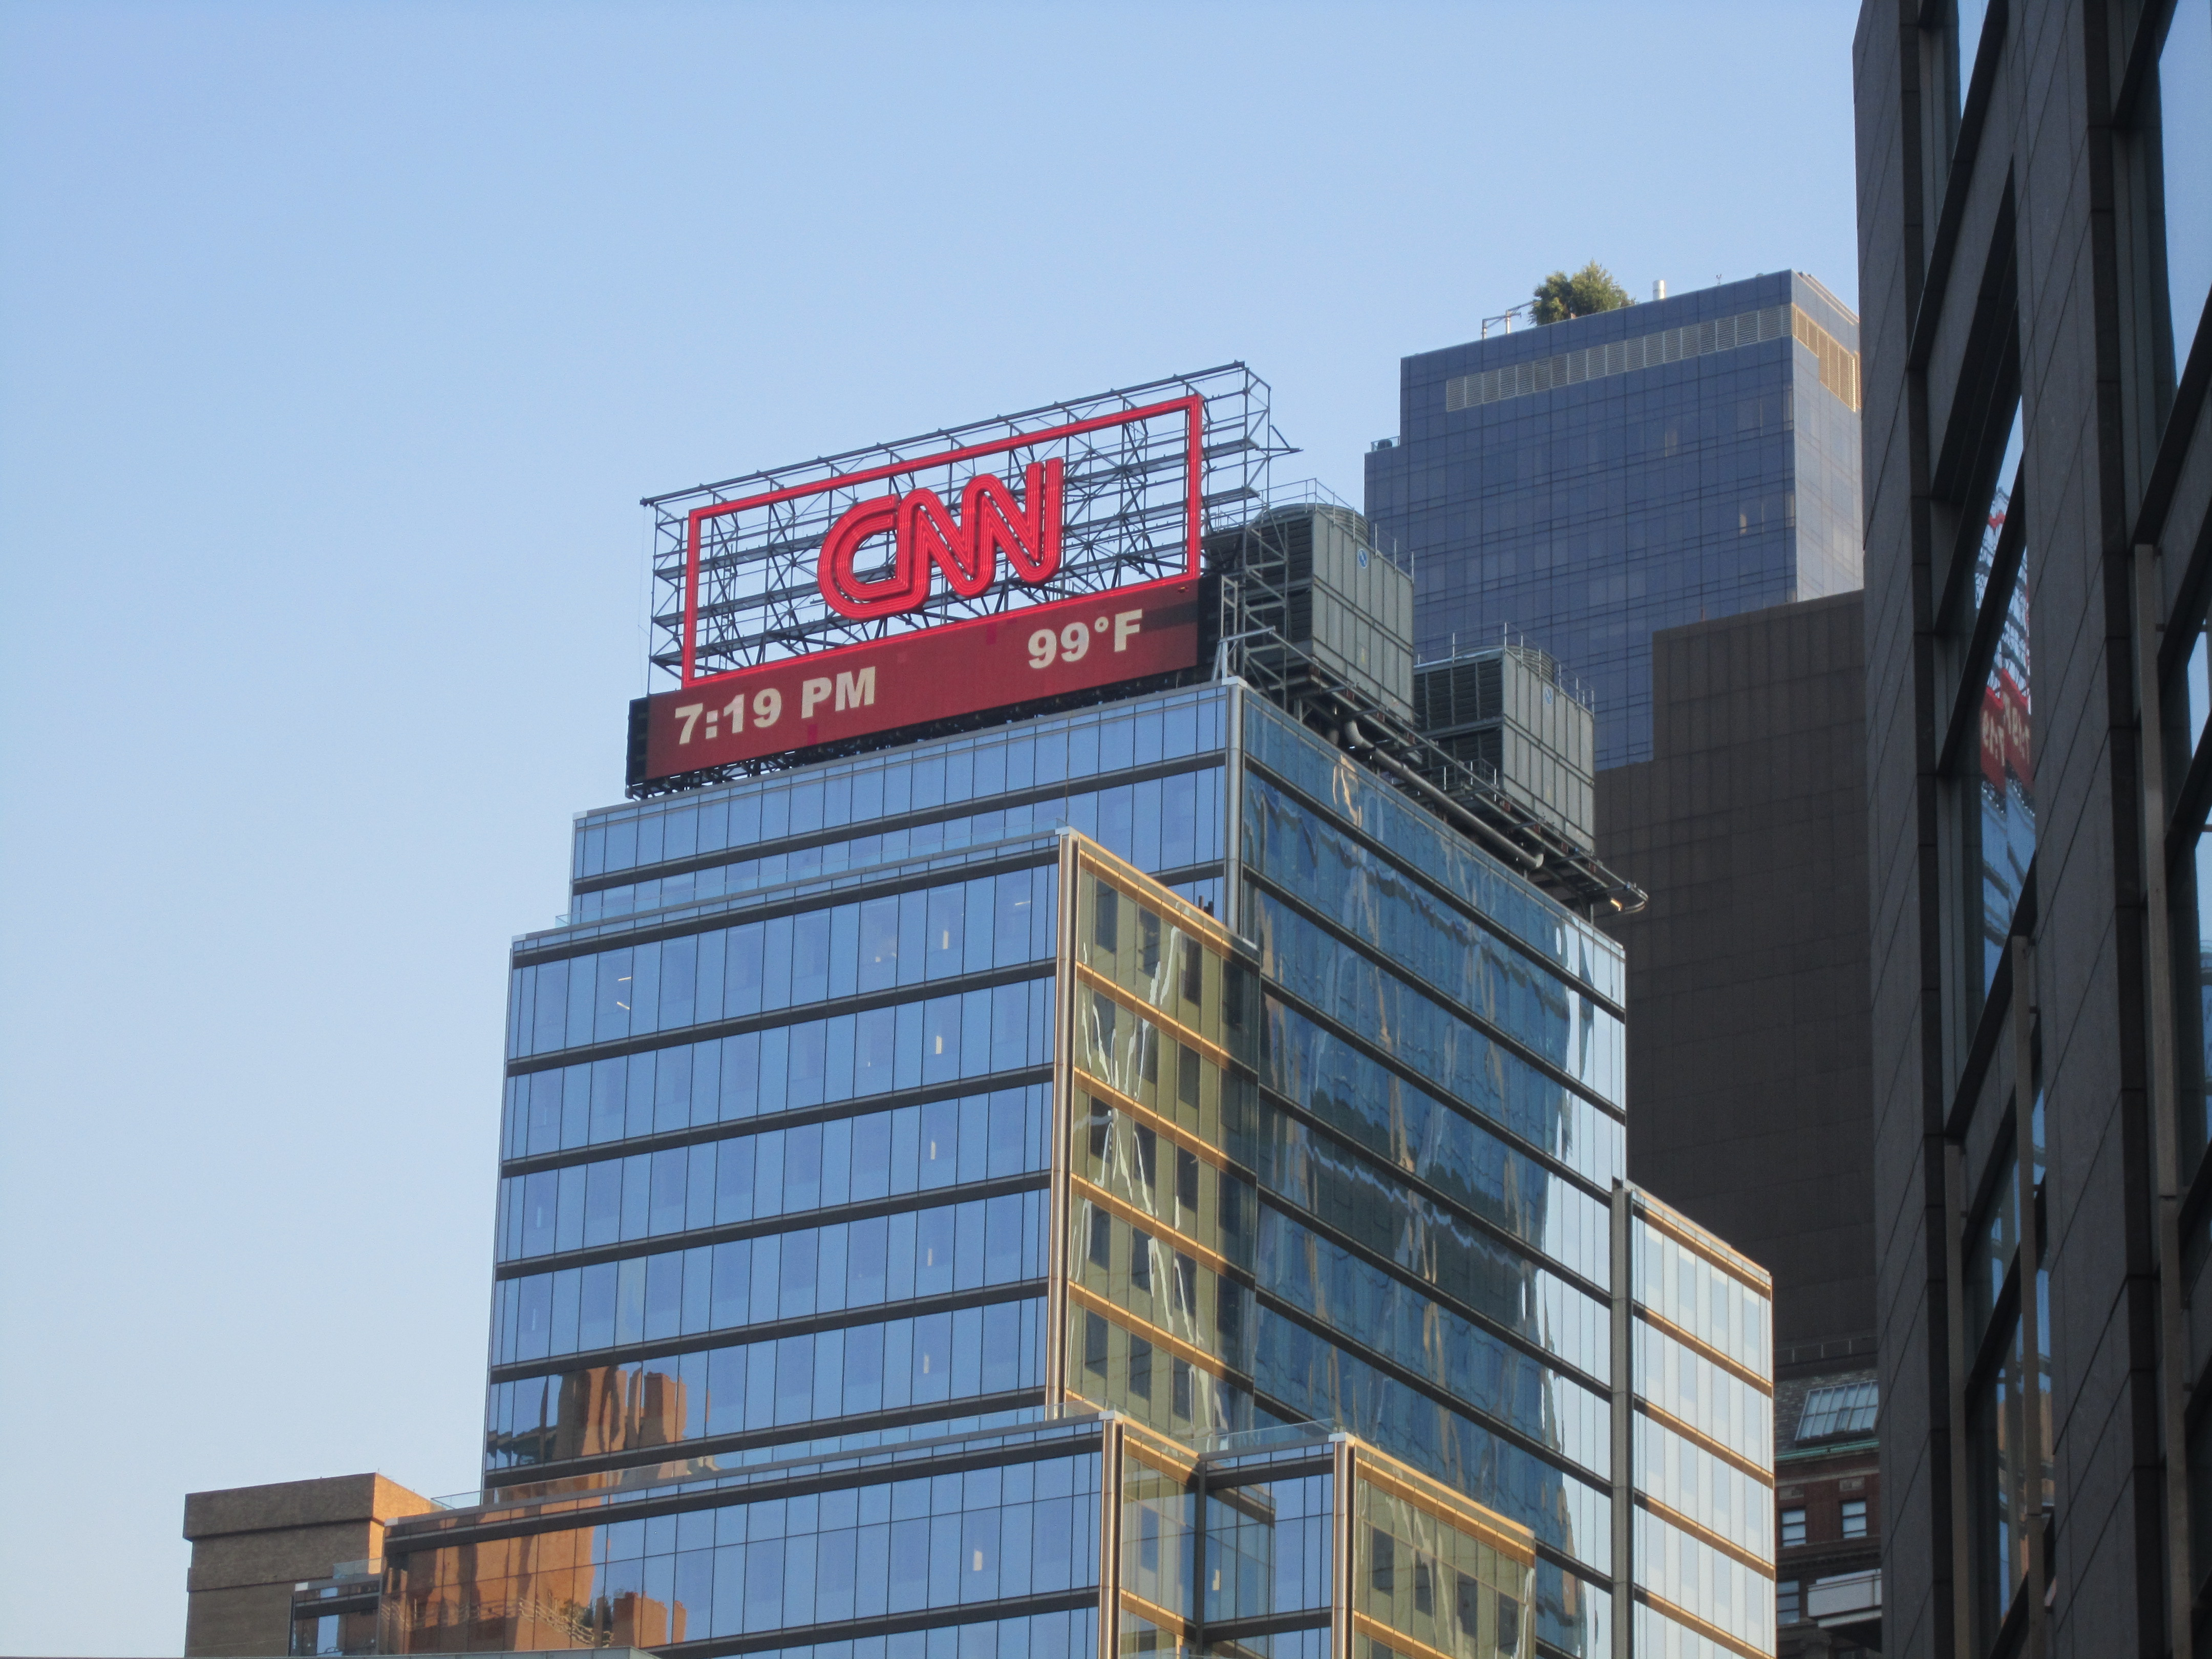 CNN in New York City